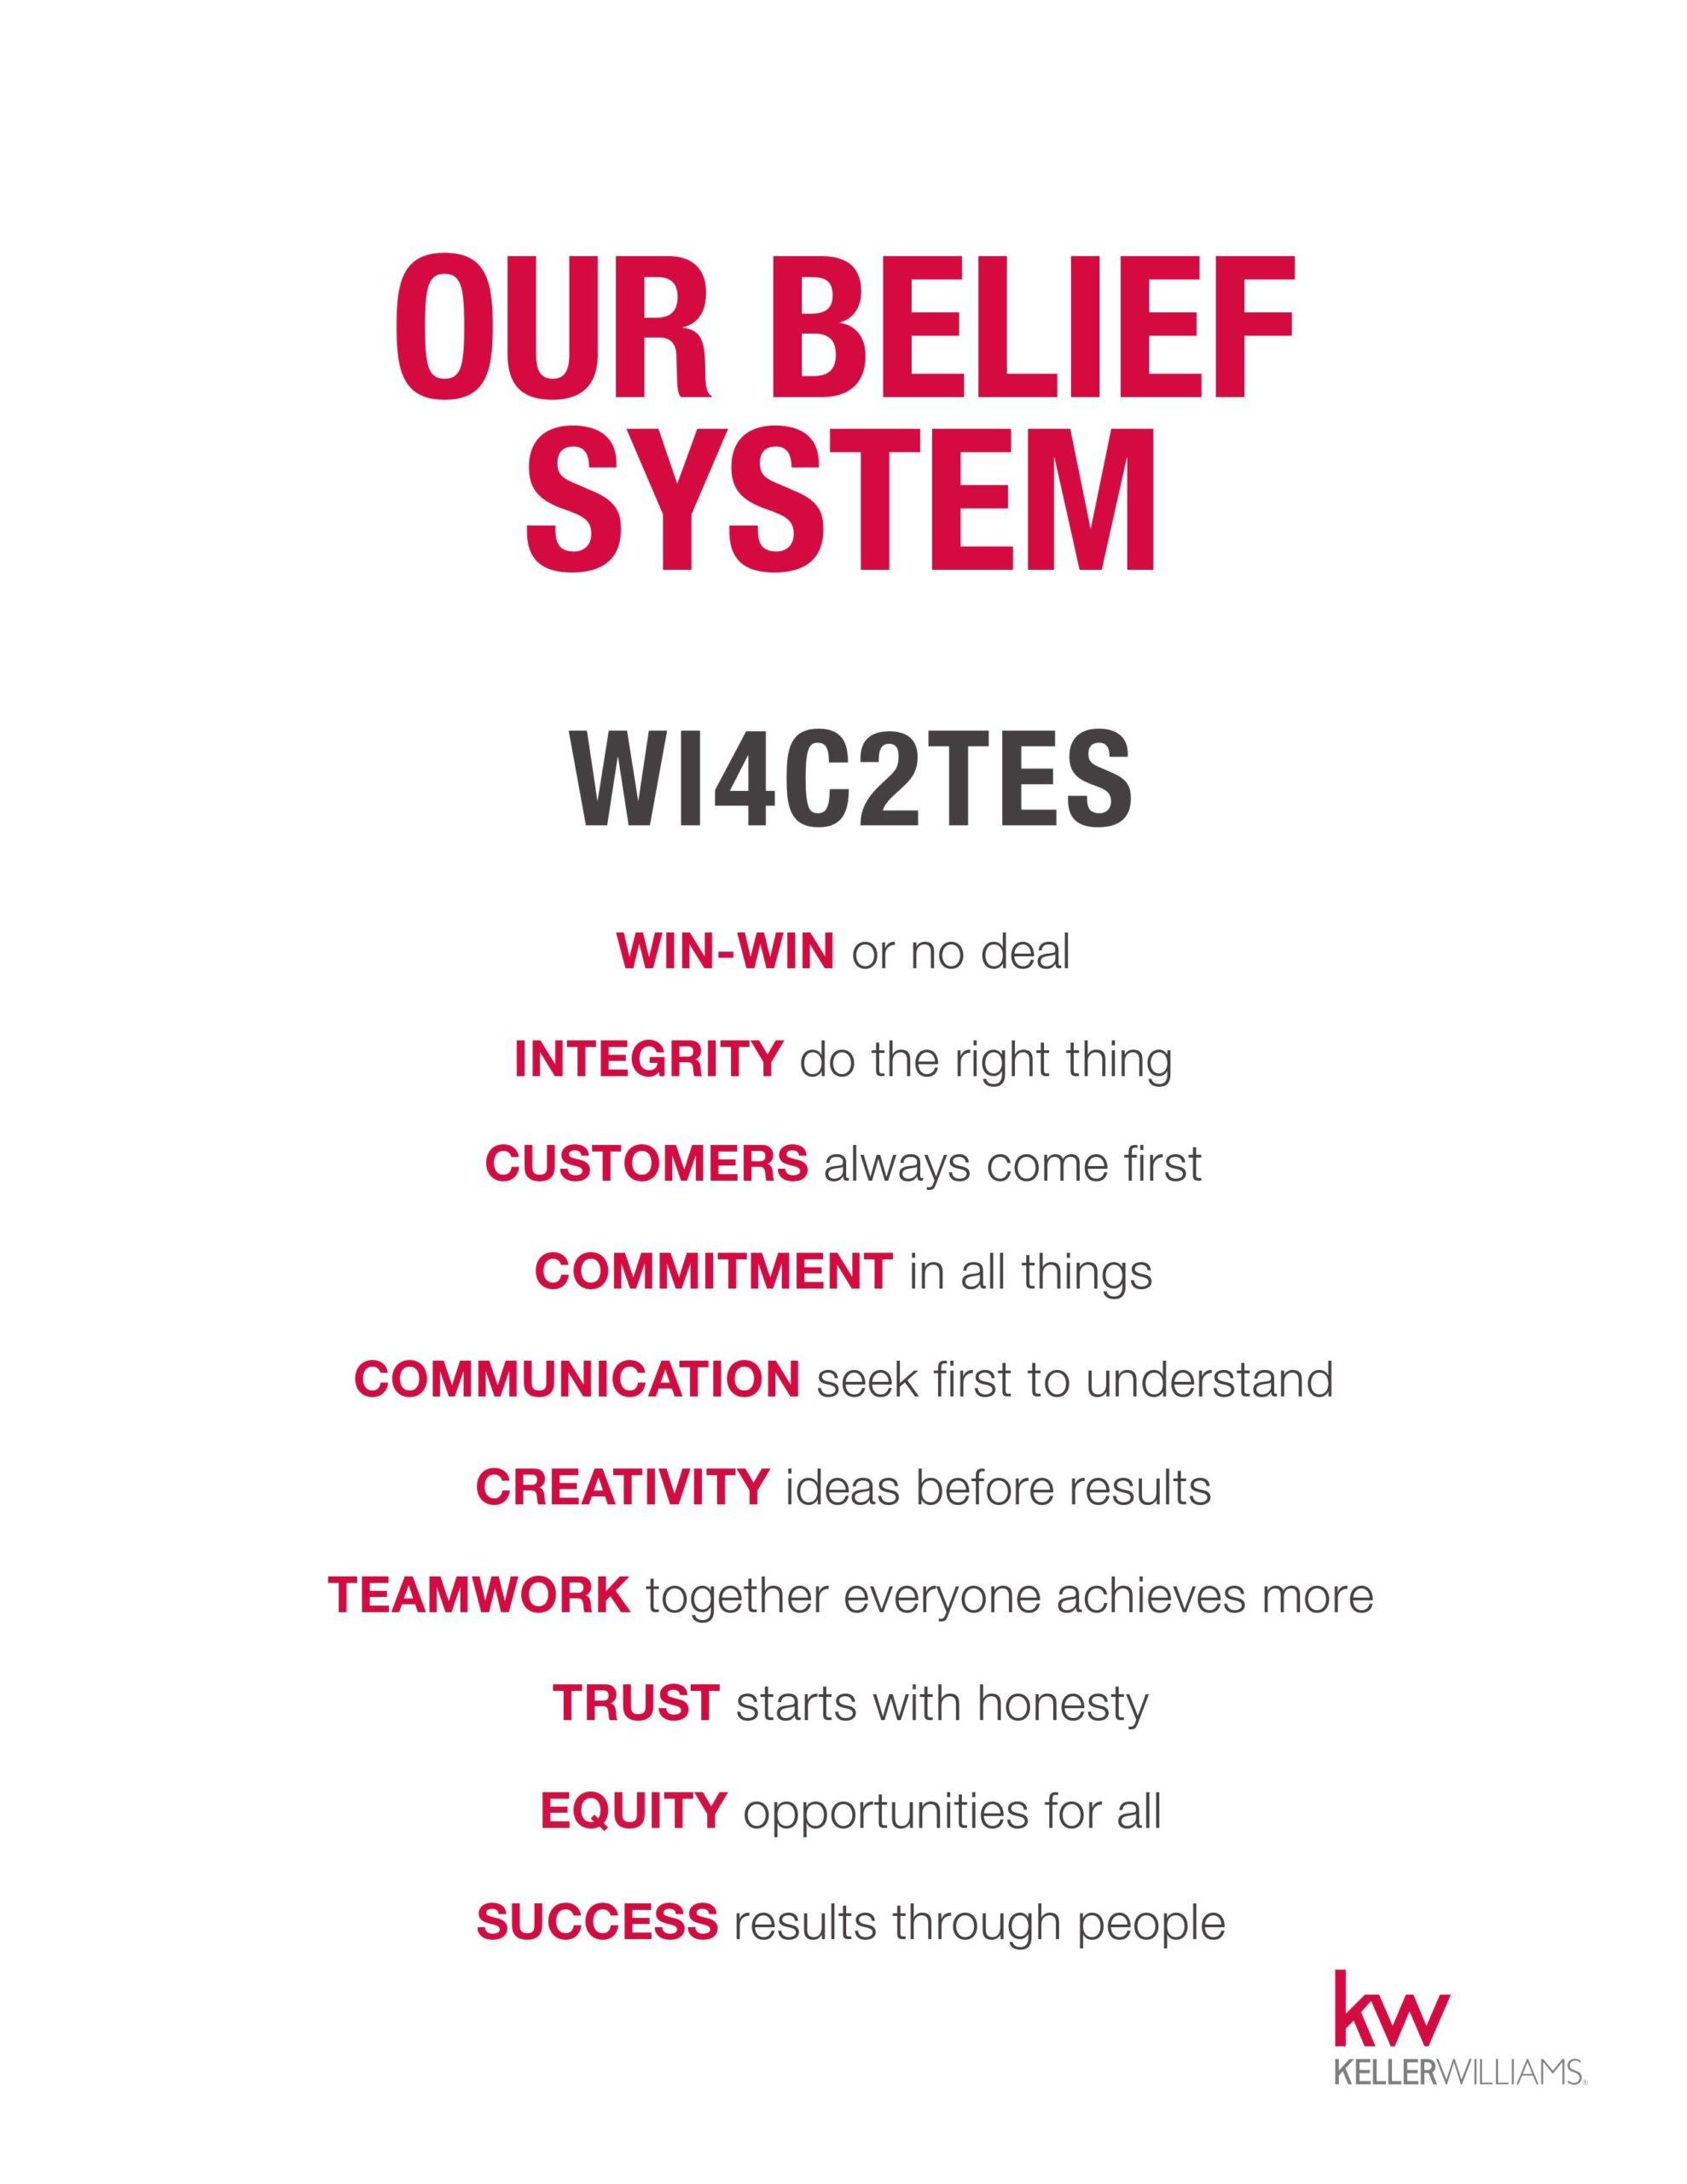 belief-system